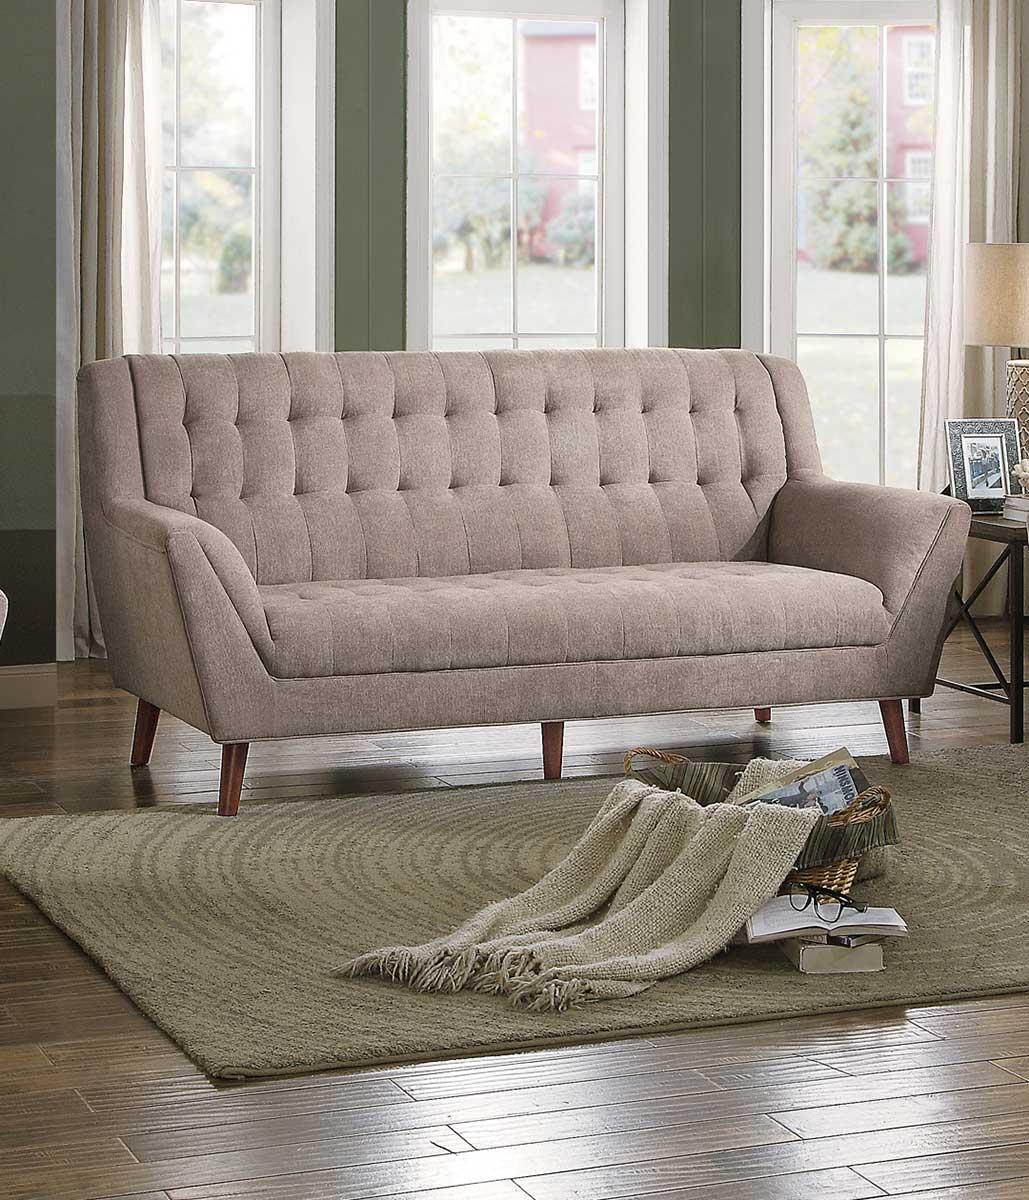 Homelegance Erath Sofa - Sand Fabric